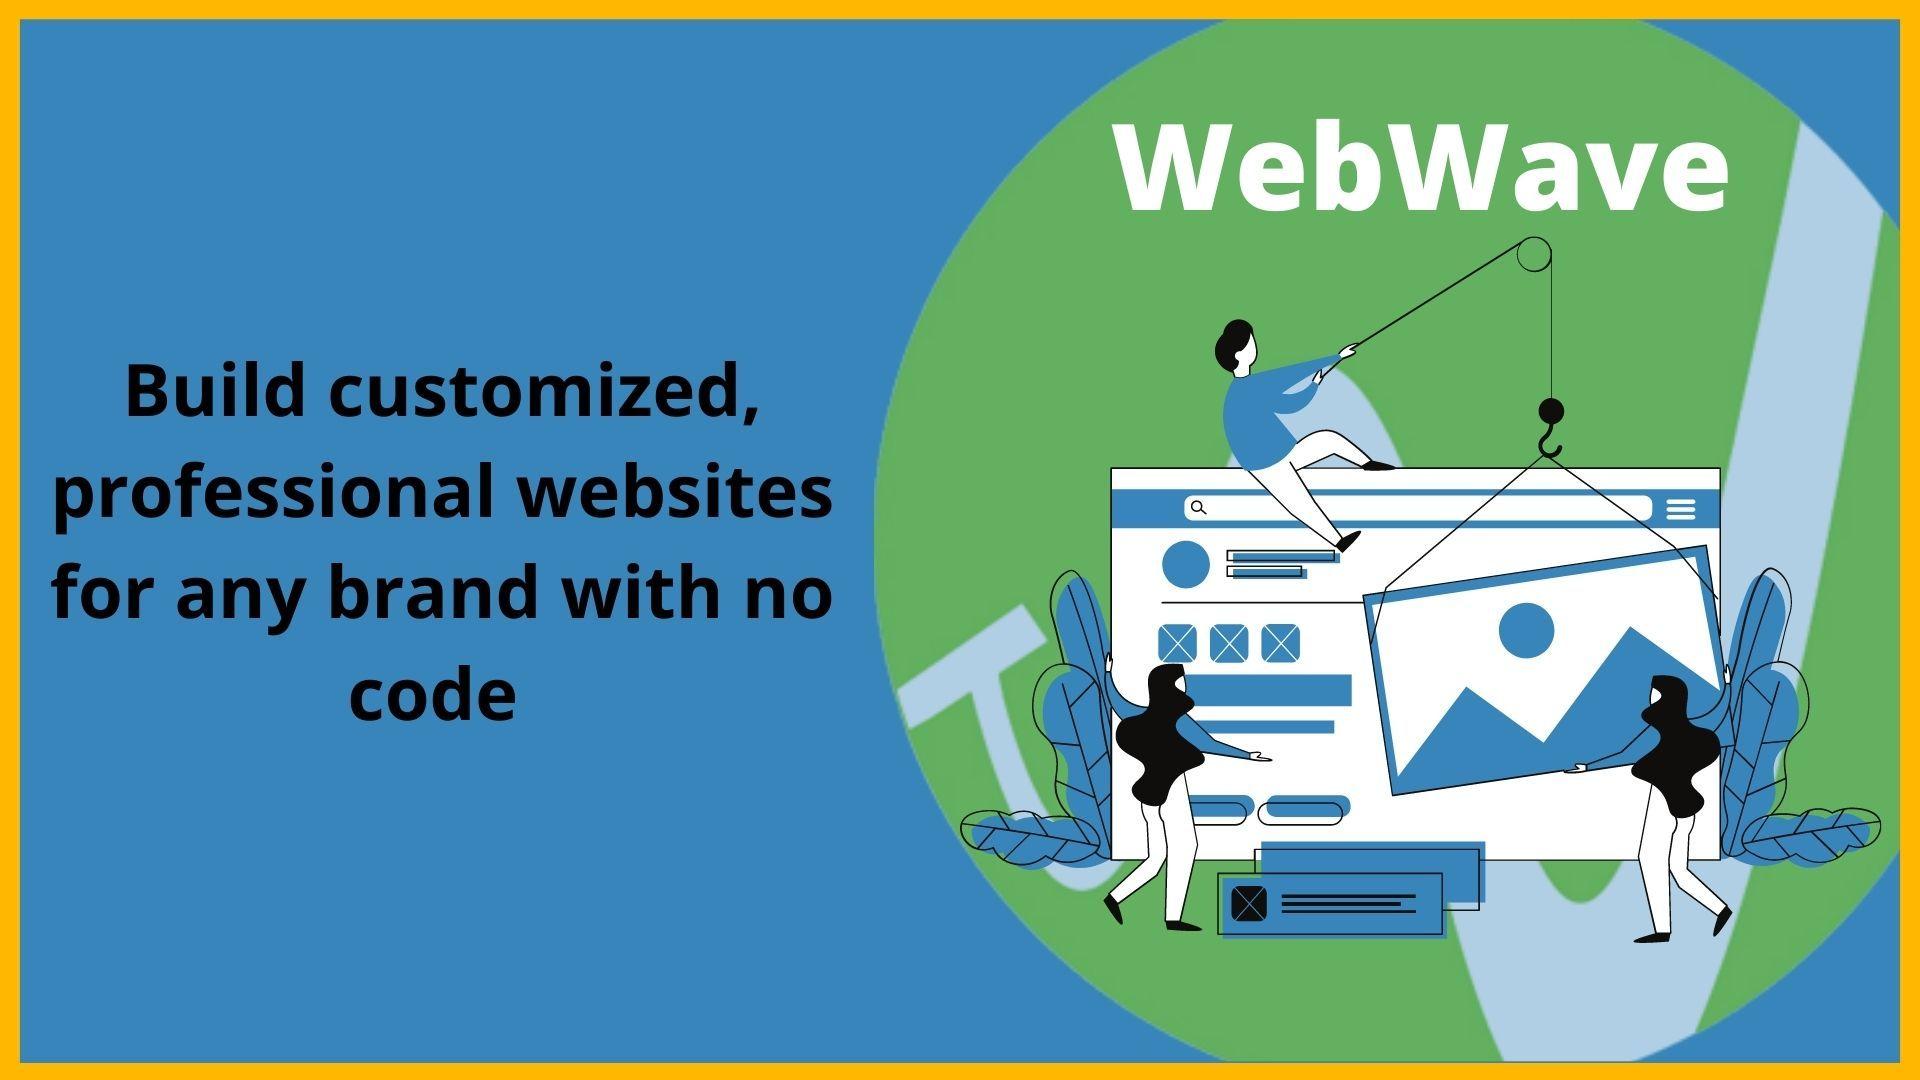 WebWave: A Packed Website Builder with Excellent Plans